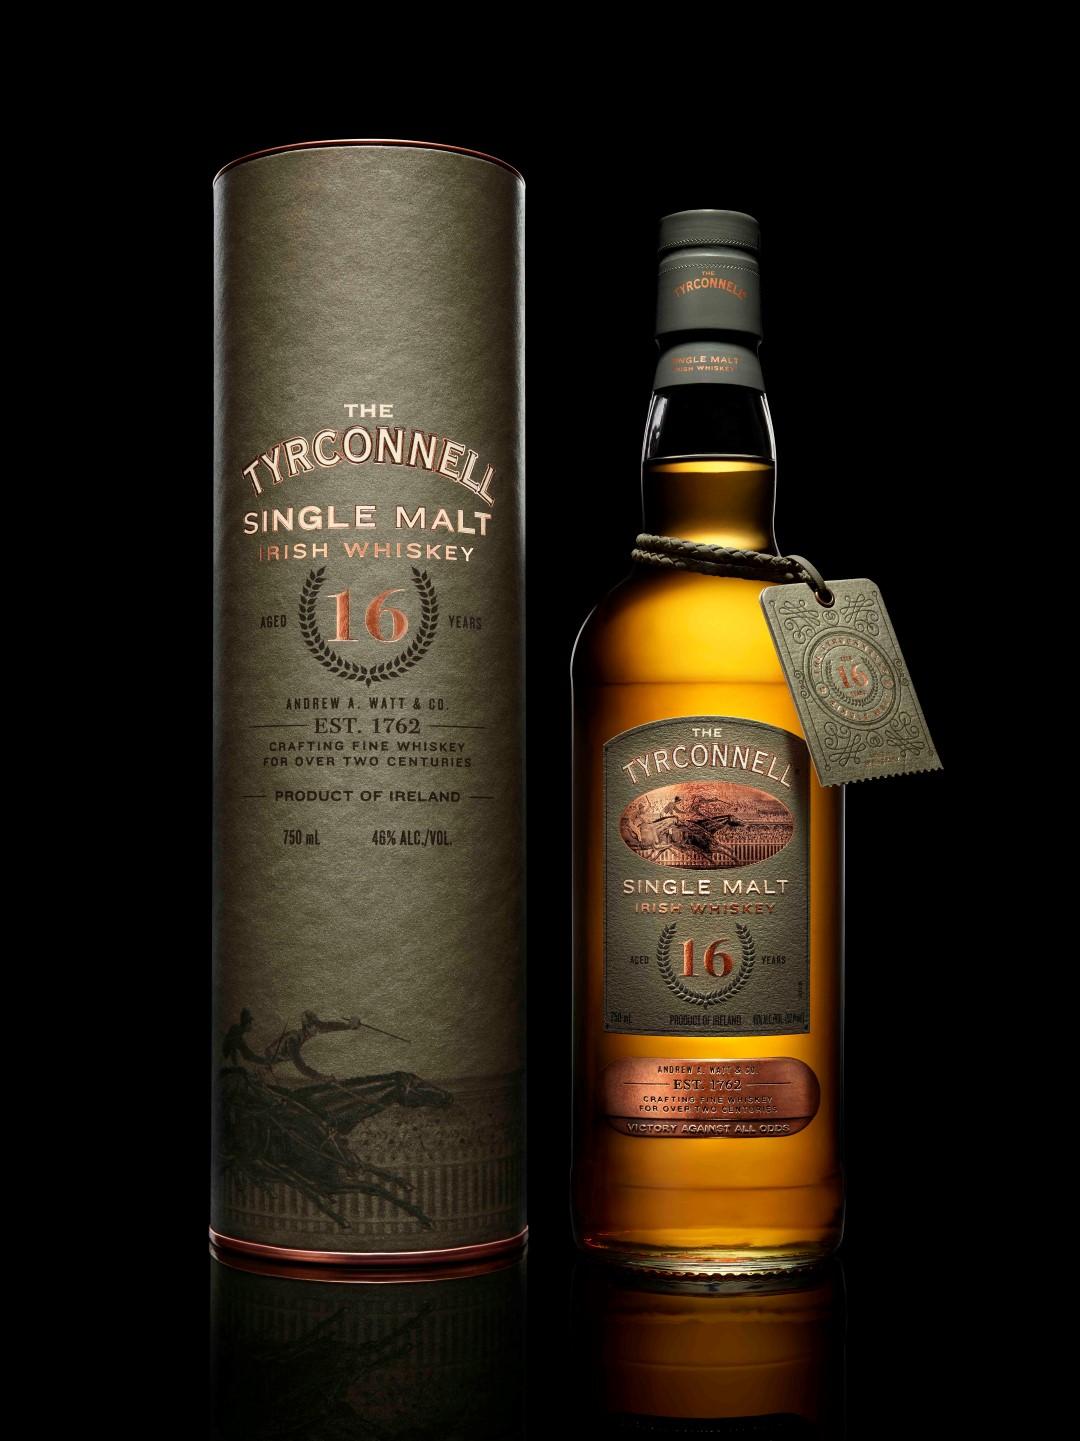 The Tyrconnell Single Malt Irish Whiskey 16 Years Old